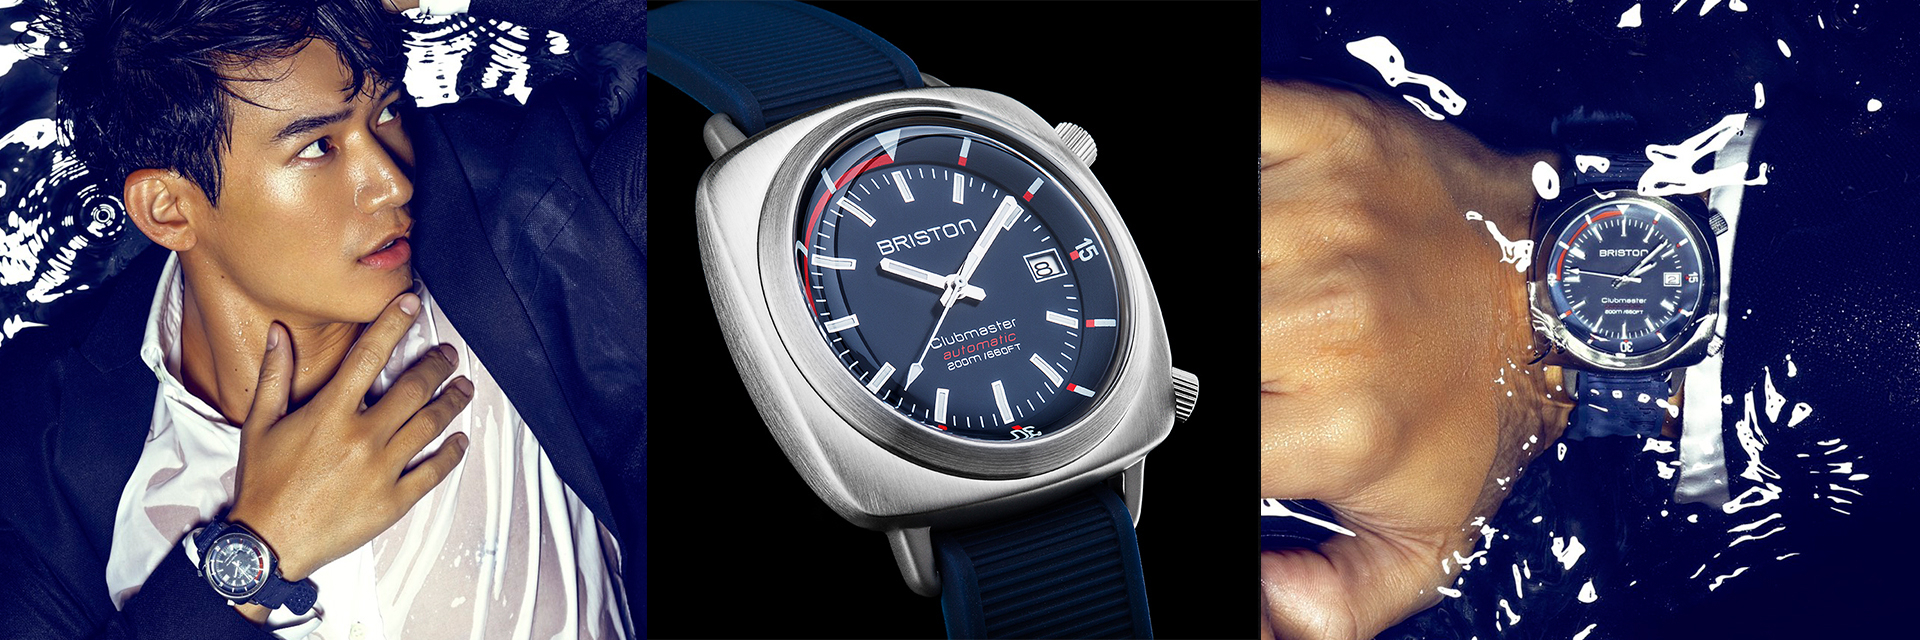 多種風格依舊 Hold 住!法國時尚運動手錶  BRISTON DIVER BRUSHED STEEL 晉升「腕錶潛力股」